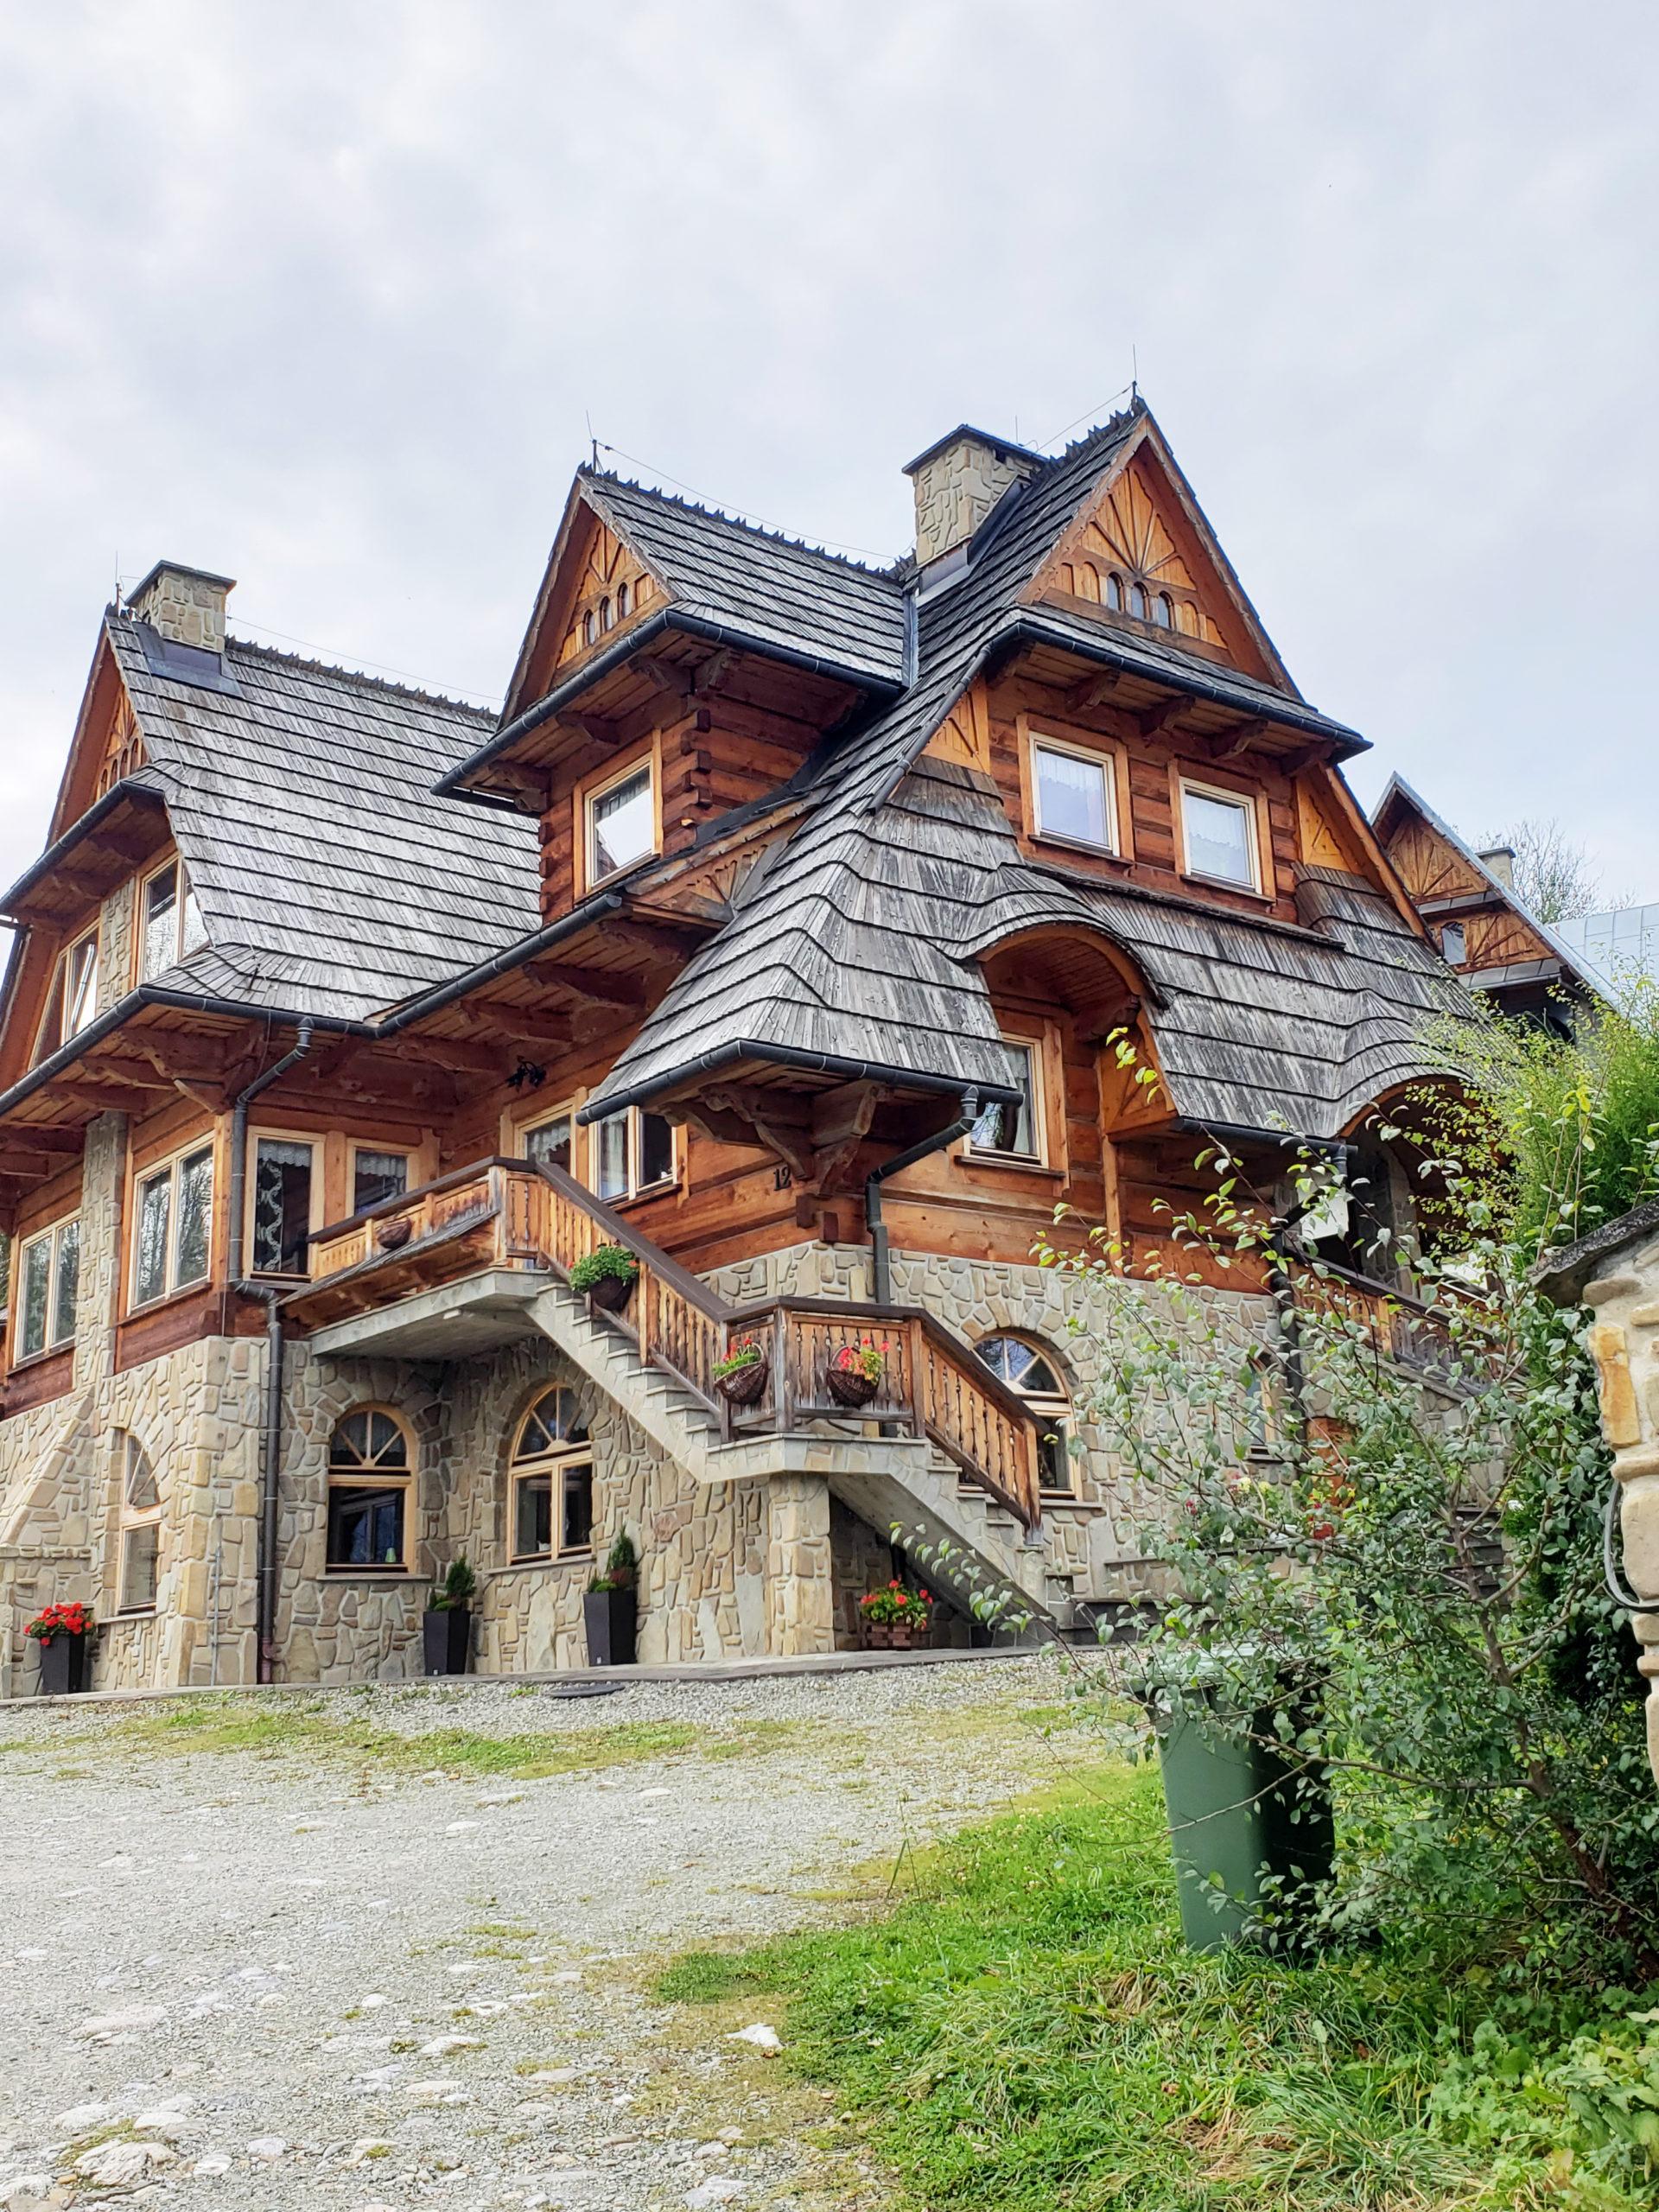 Discovering Beautiful Zakopane - Poland's Most Popular Mountain Village